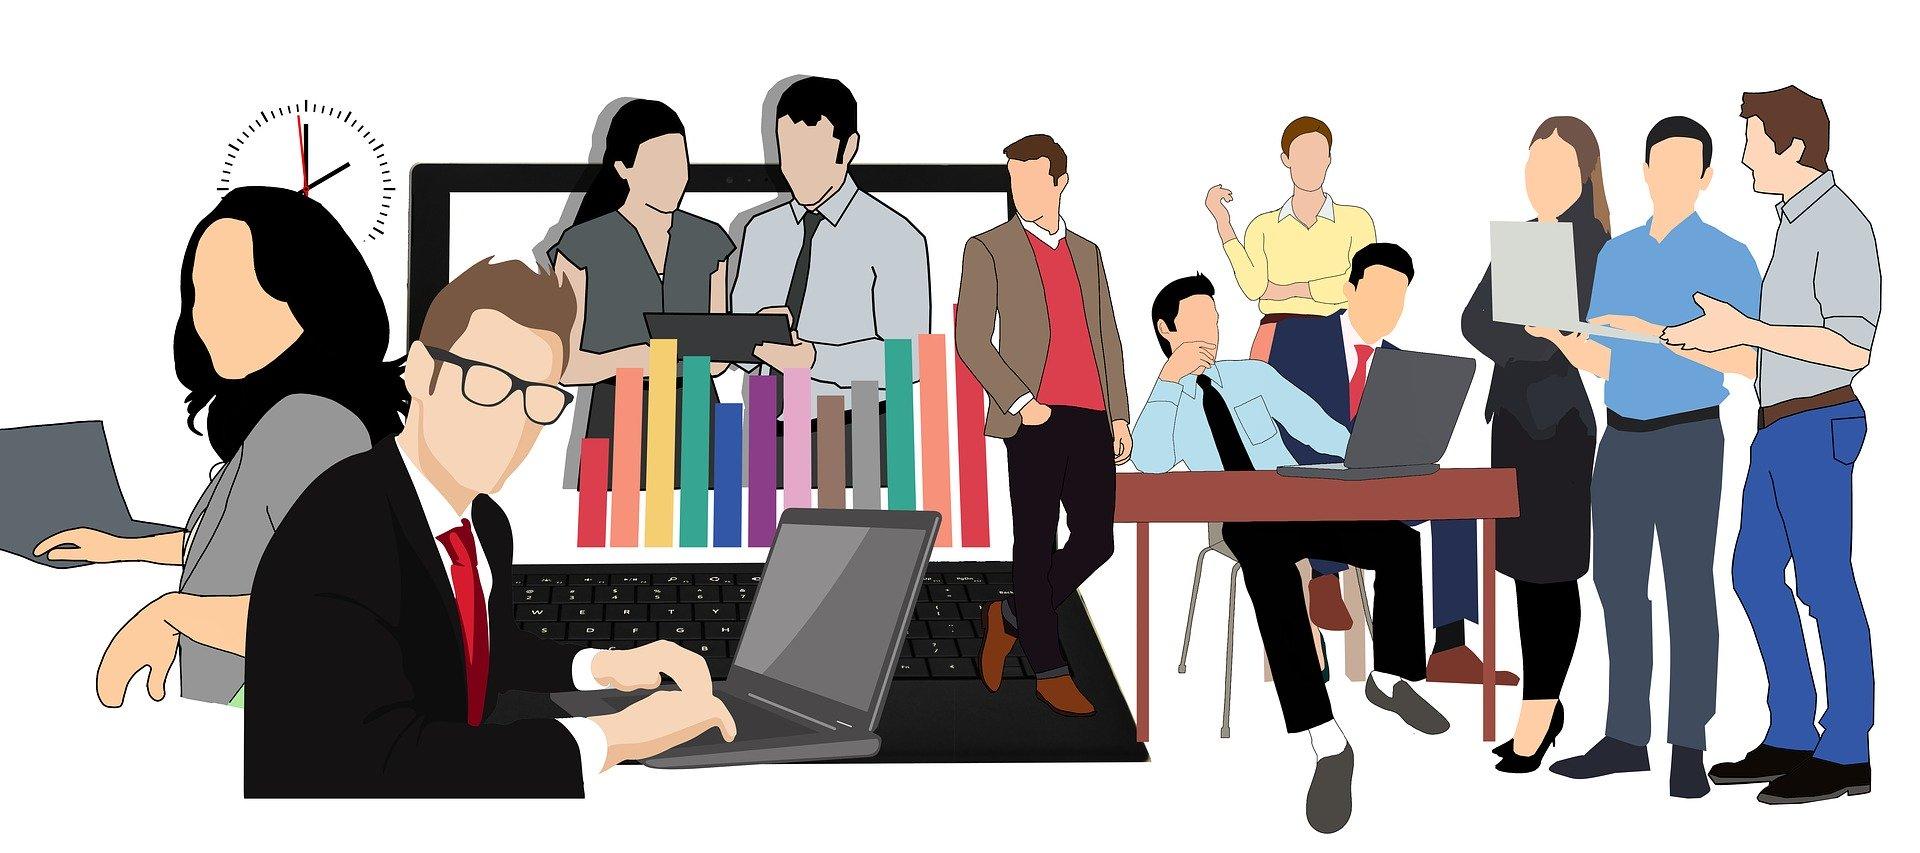 корпоративная культура в компании